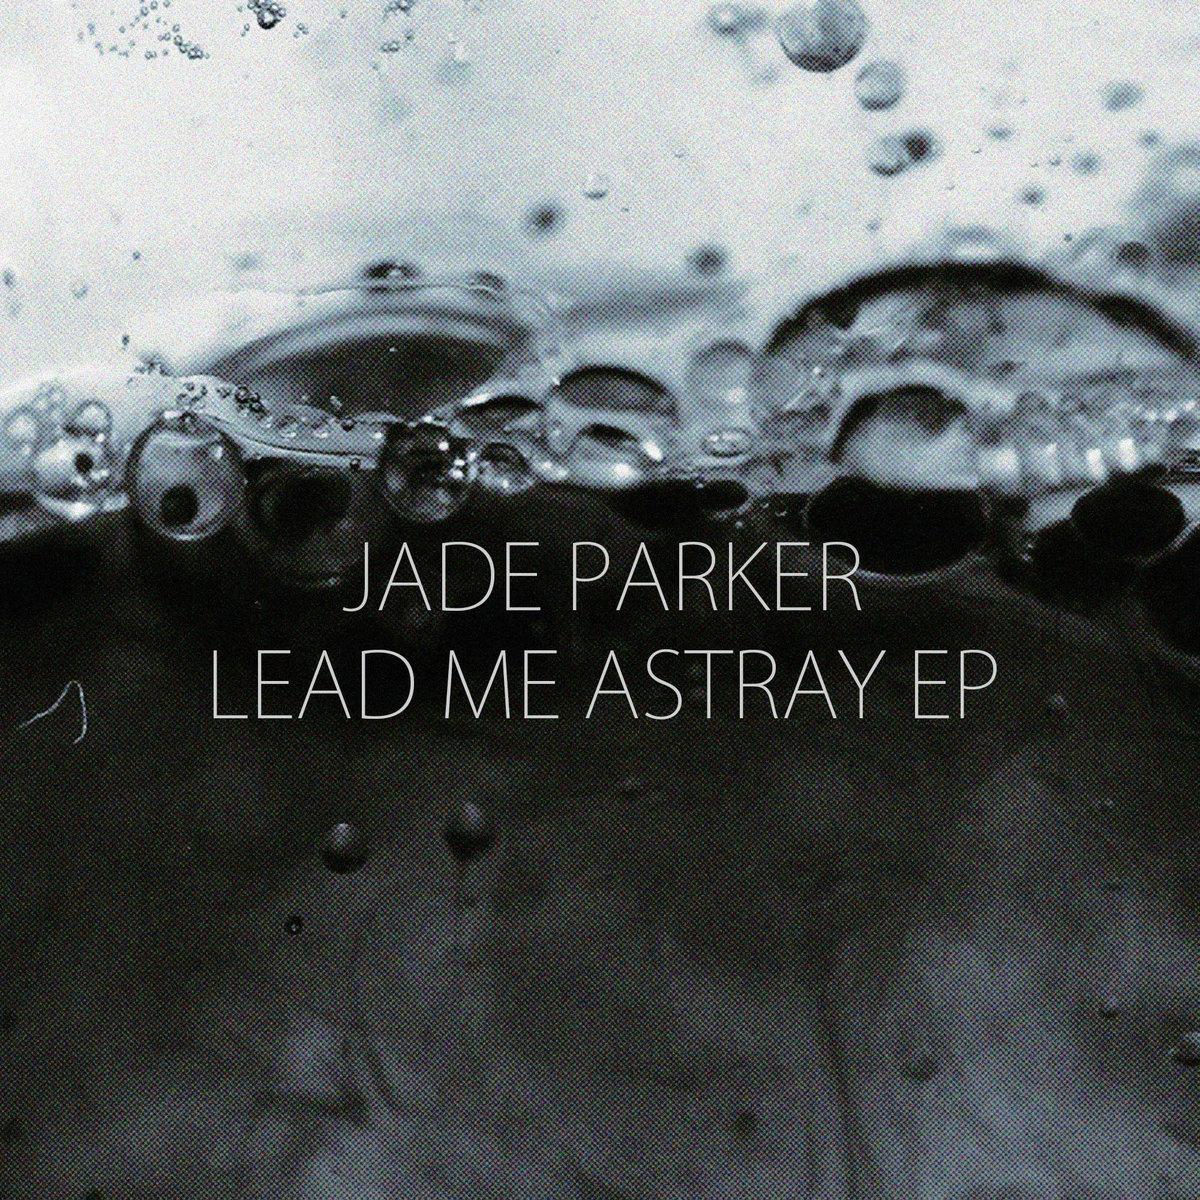 Jade Parker Lead Me Astray